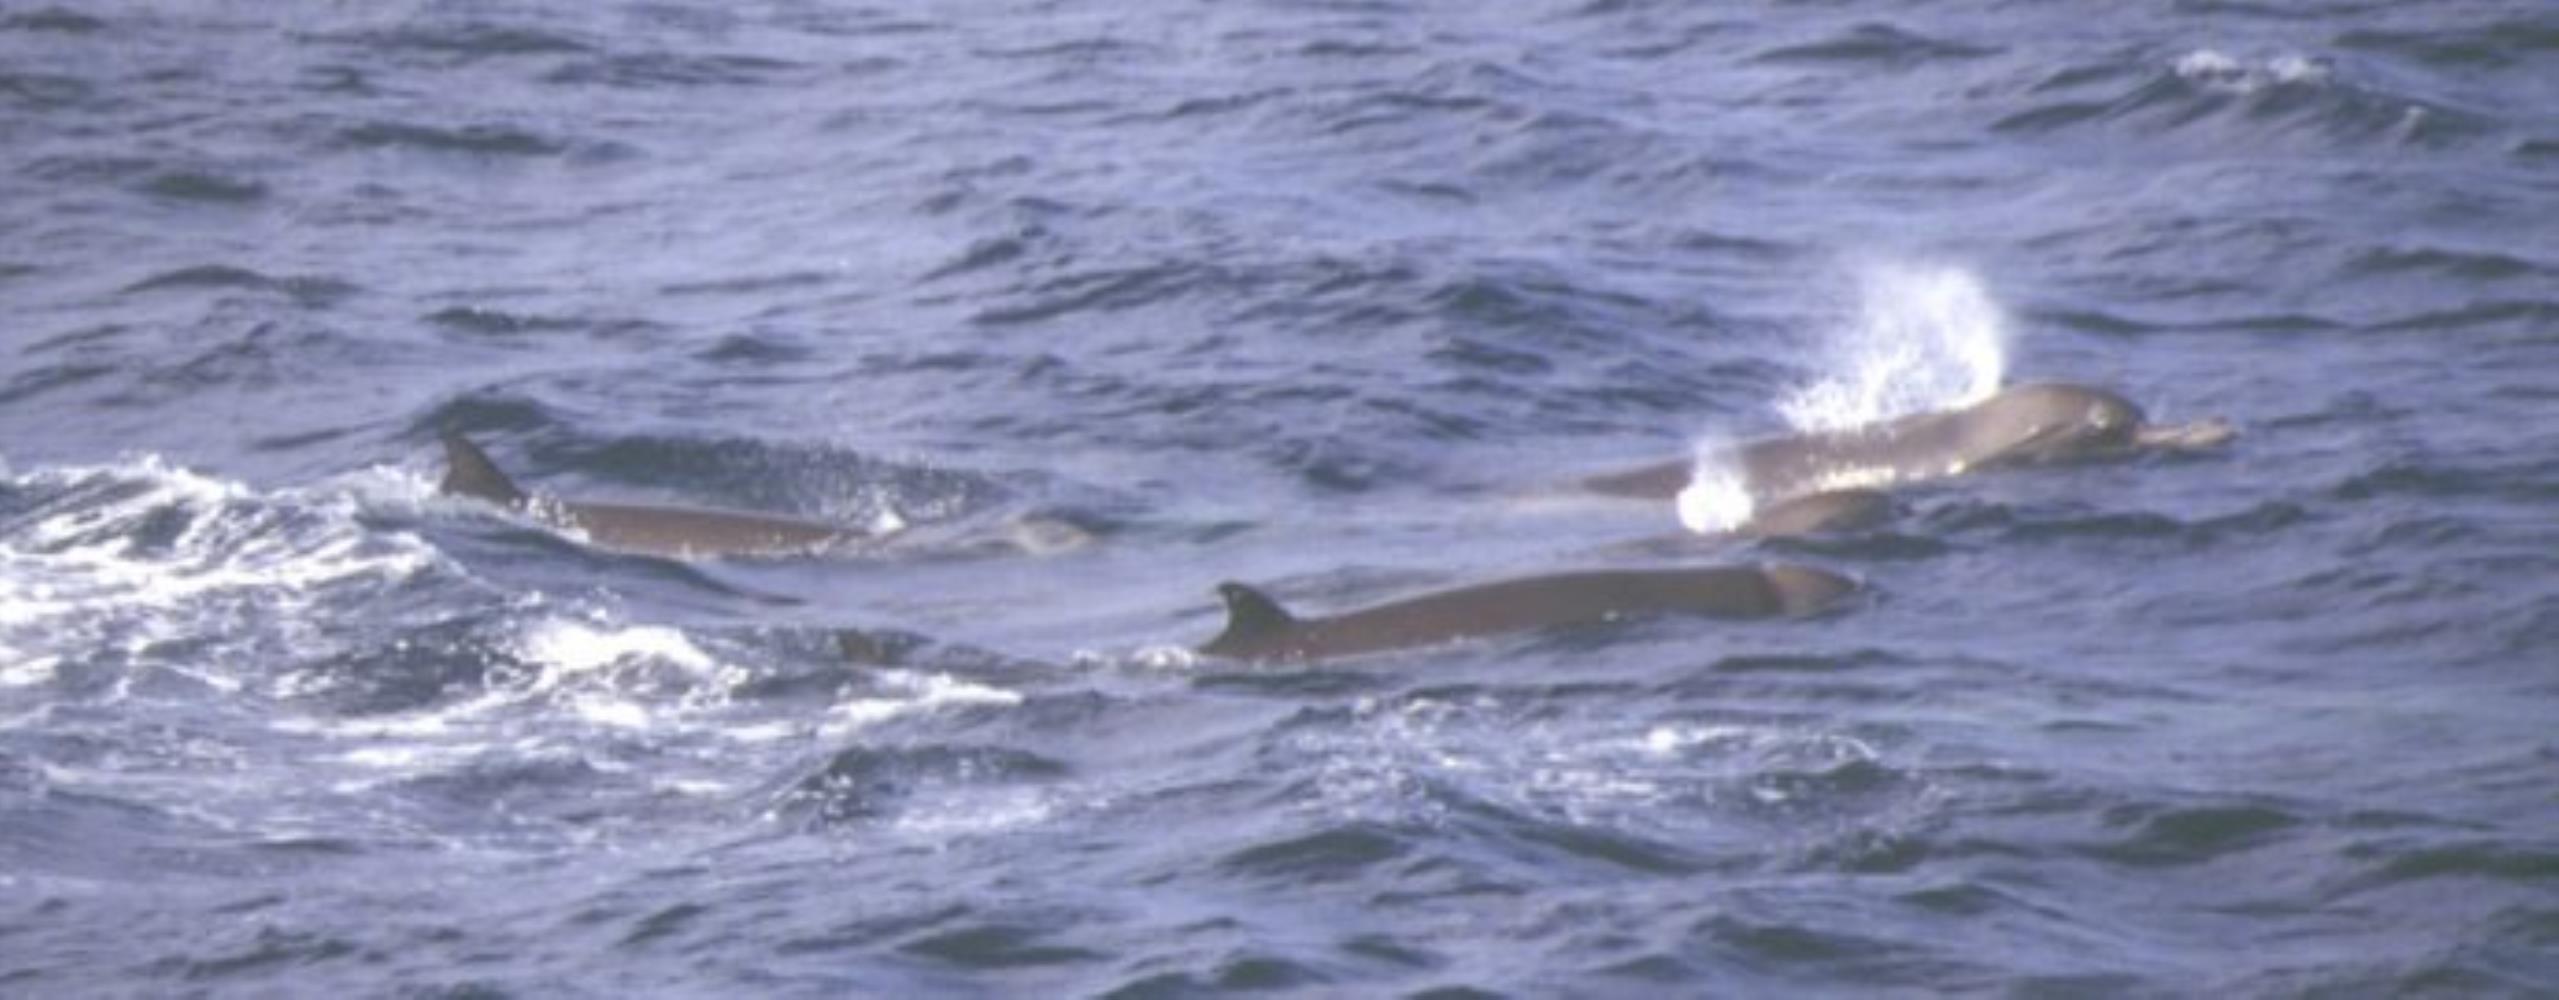 Longman's Beaked Whale